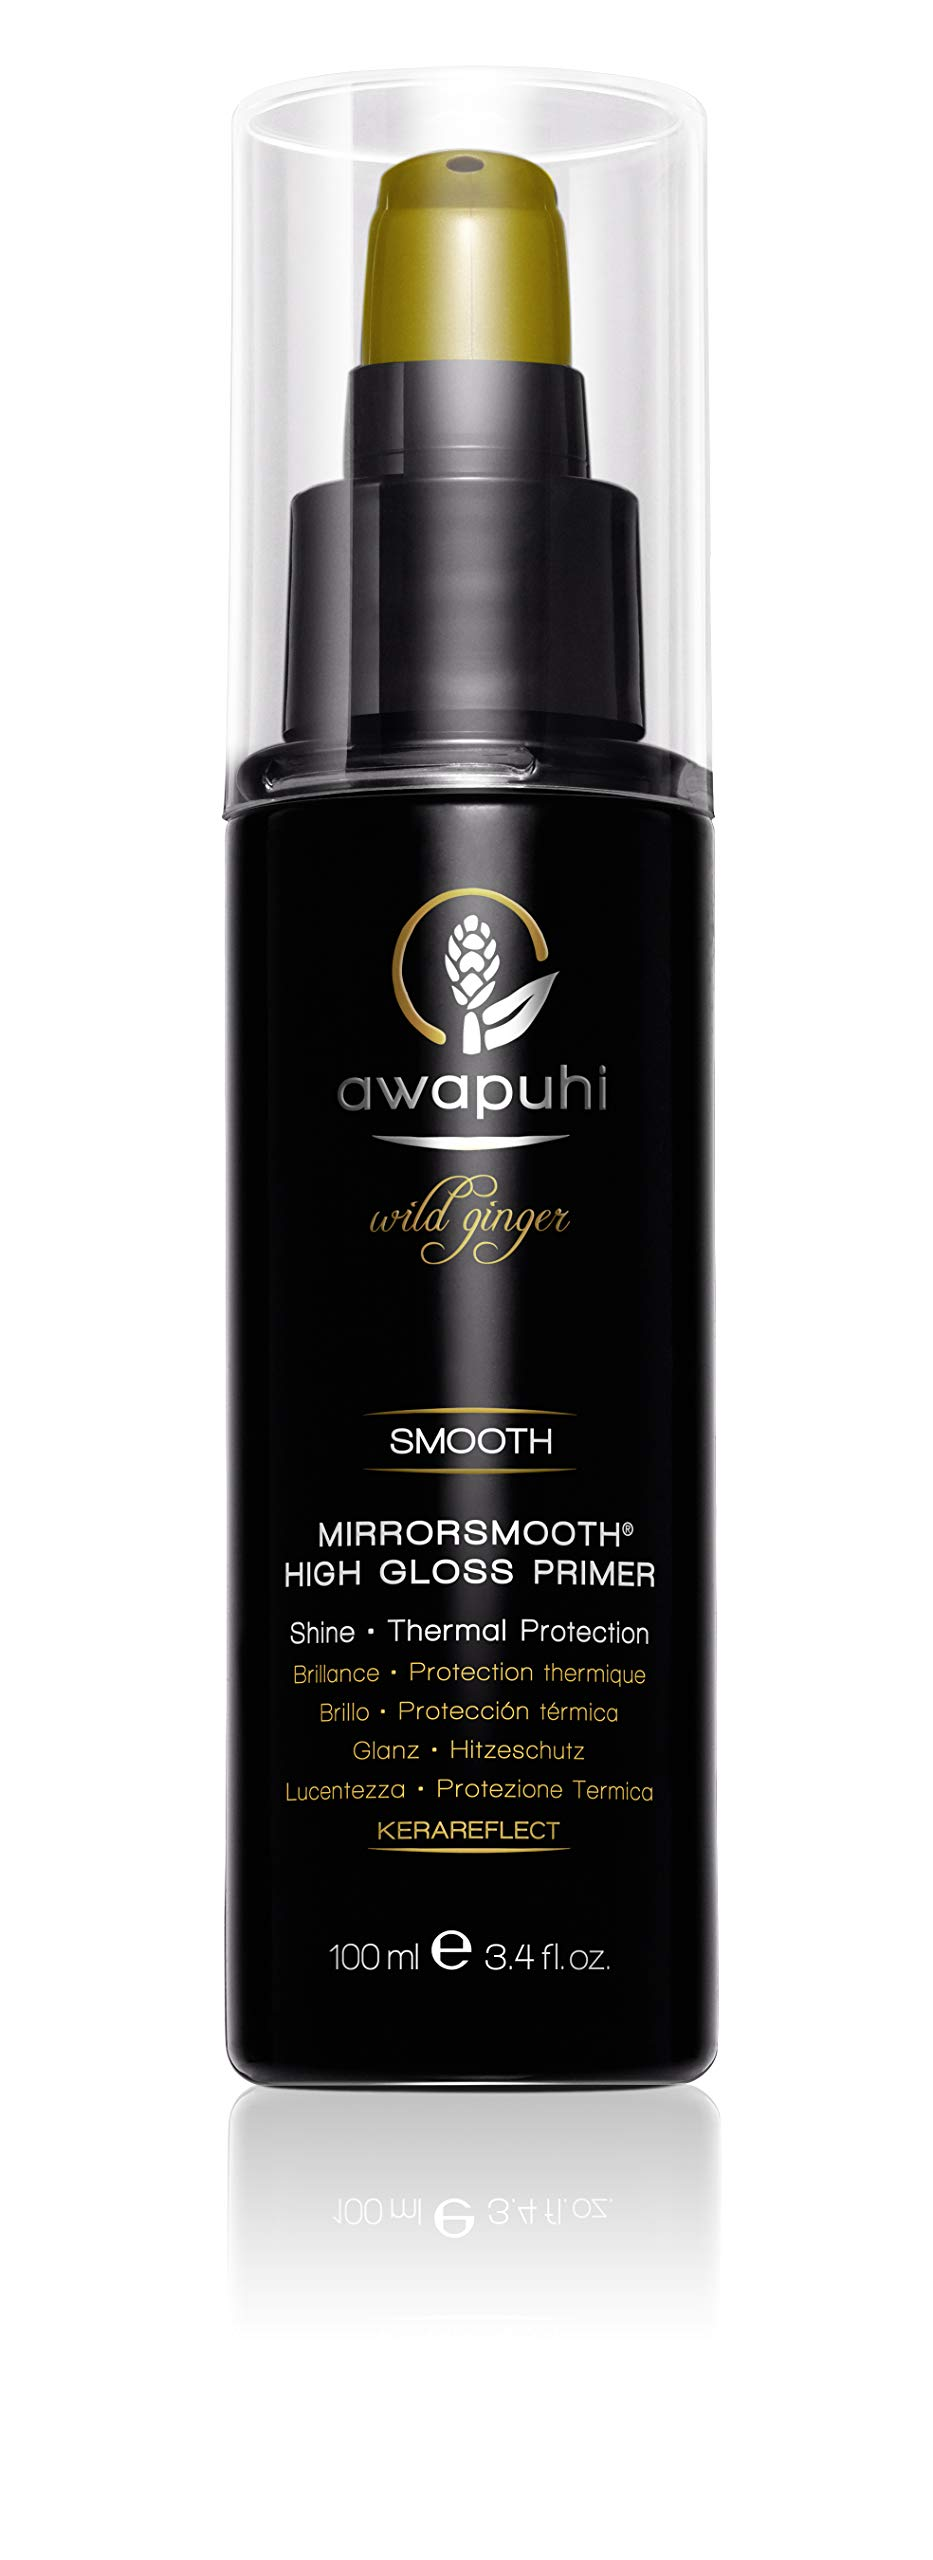 Awapuhi Wild Ginger MirrorSmooth High Gloss Primer by Awapuhi Wild Ginger